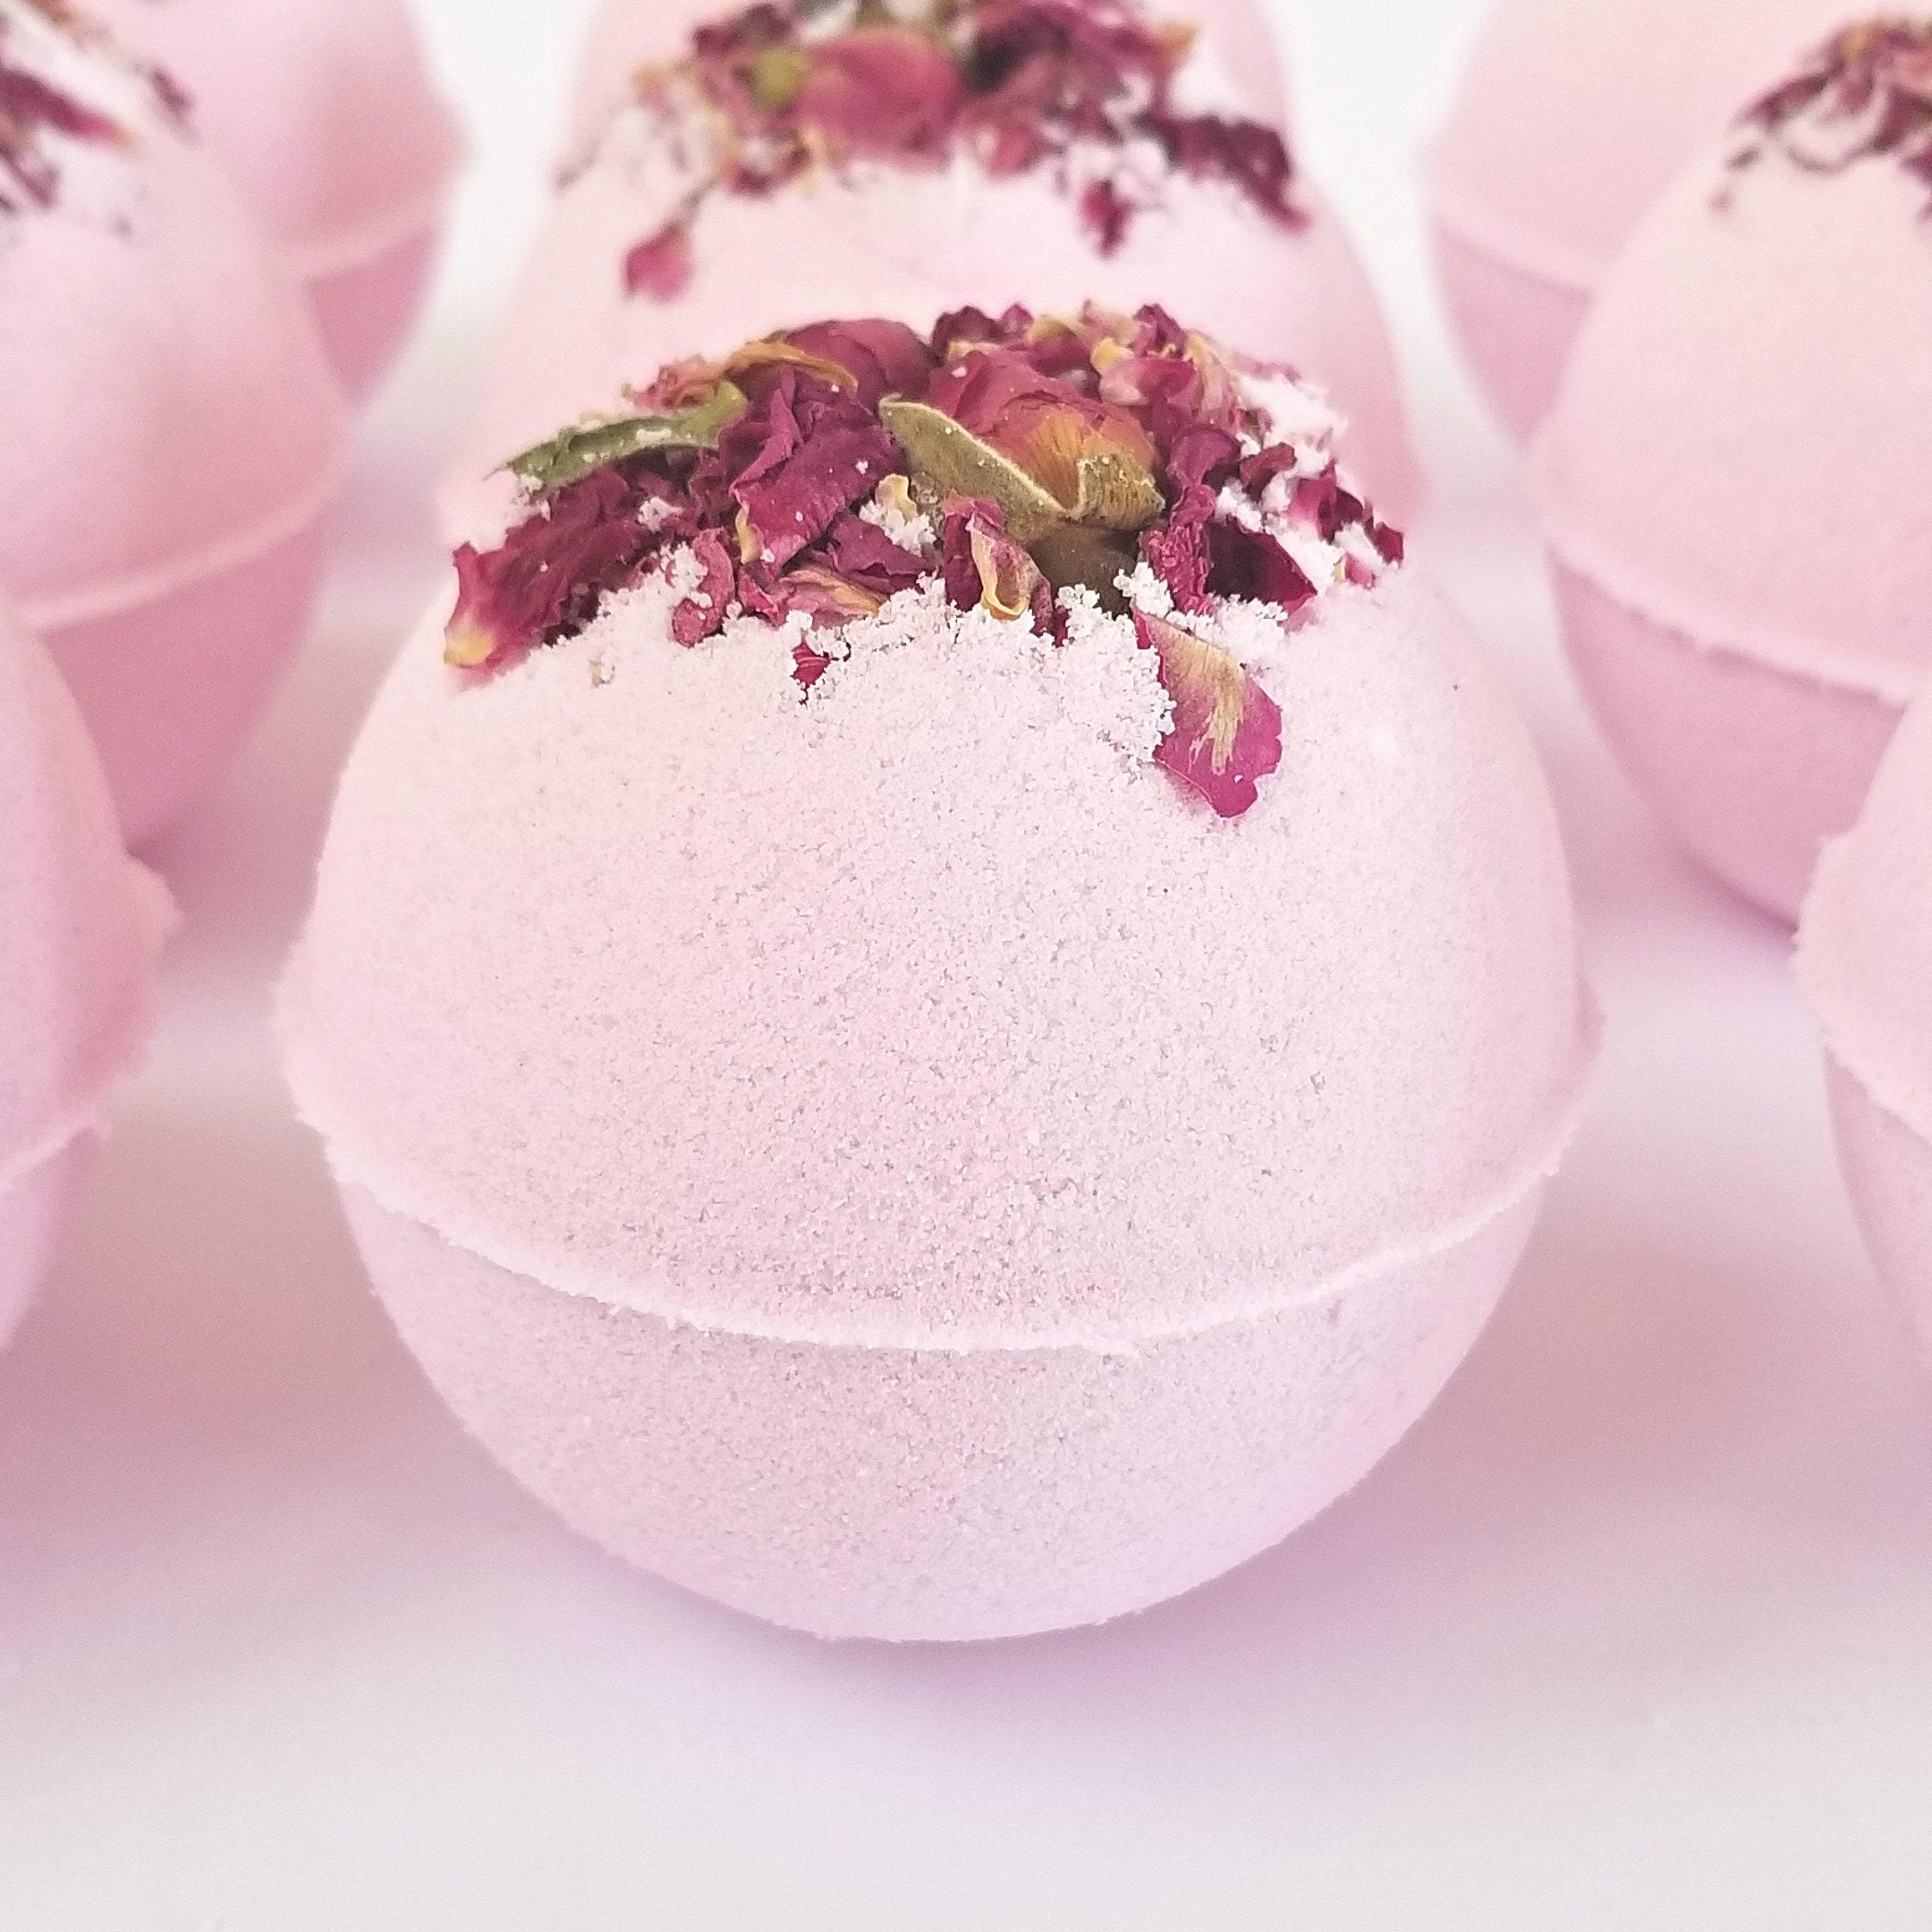 Japanese Cherry Blossom Bath Bombs Blush Bridal Shower Favors | Etsy